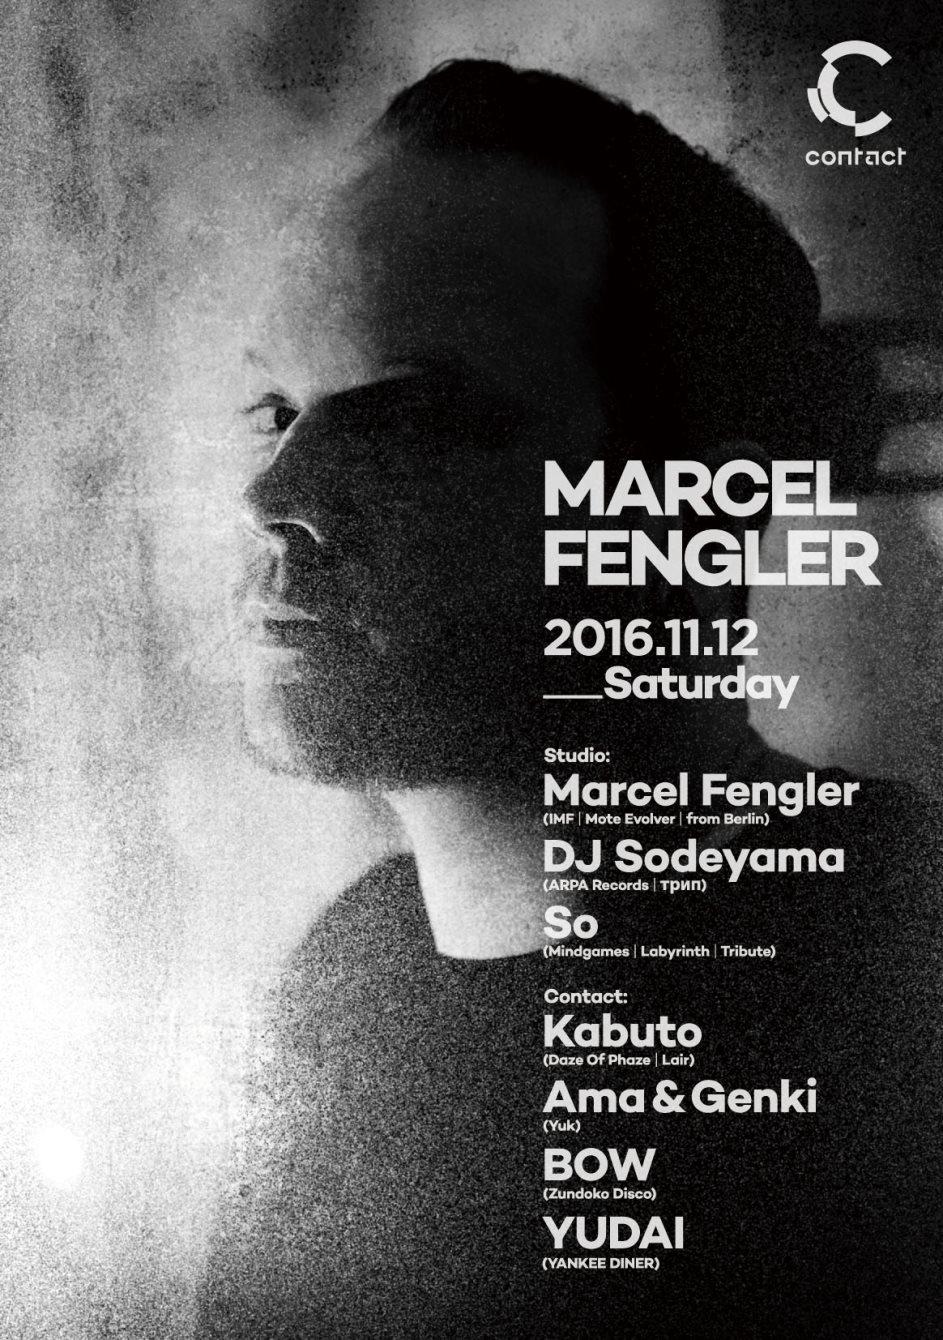 Marcel Fengler - Flyer front